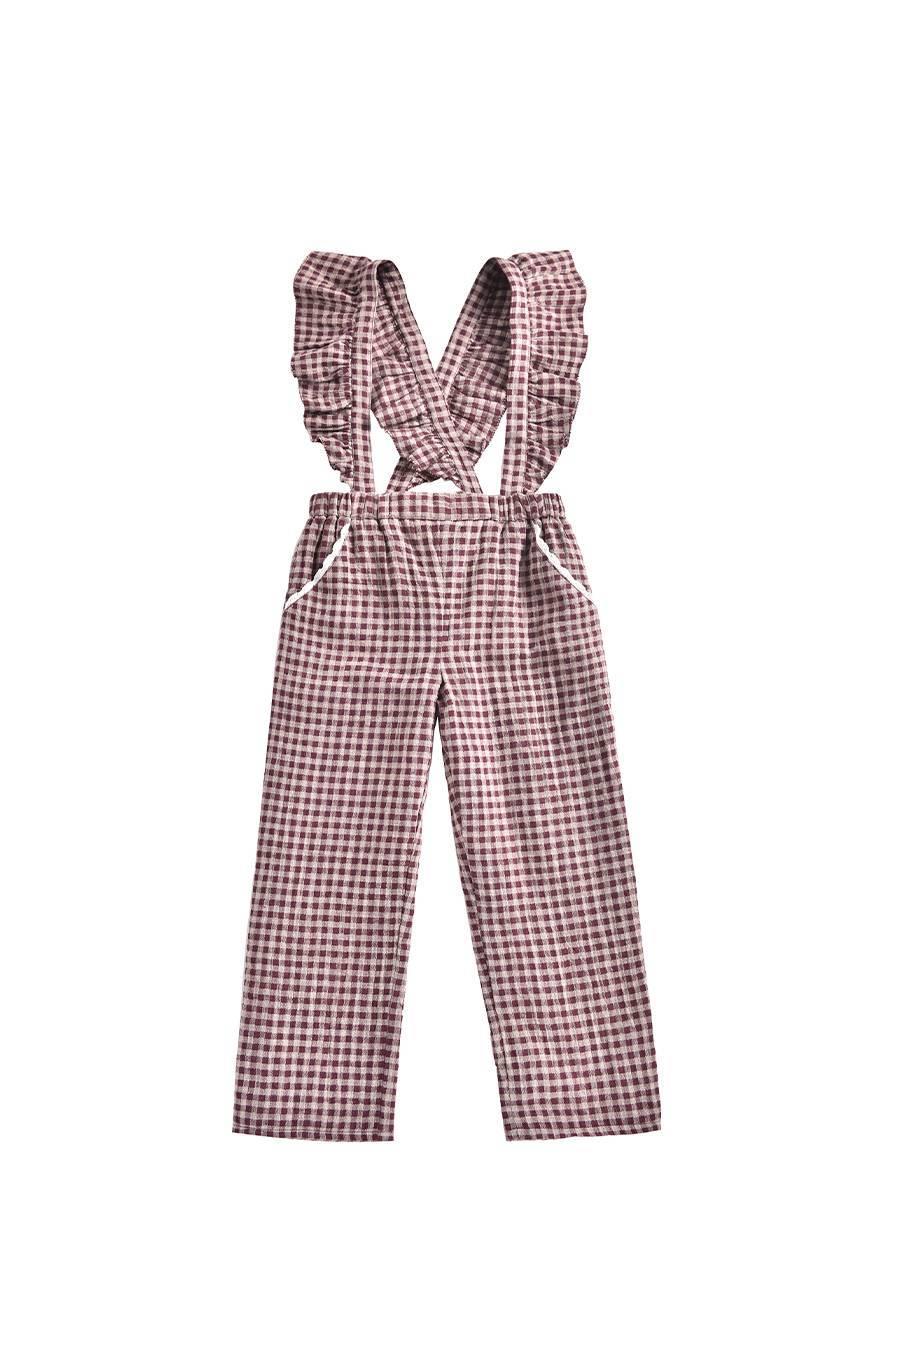 boheme chic vintage pantalon bébé fille amba aubergine vichy